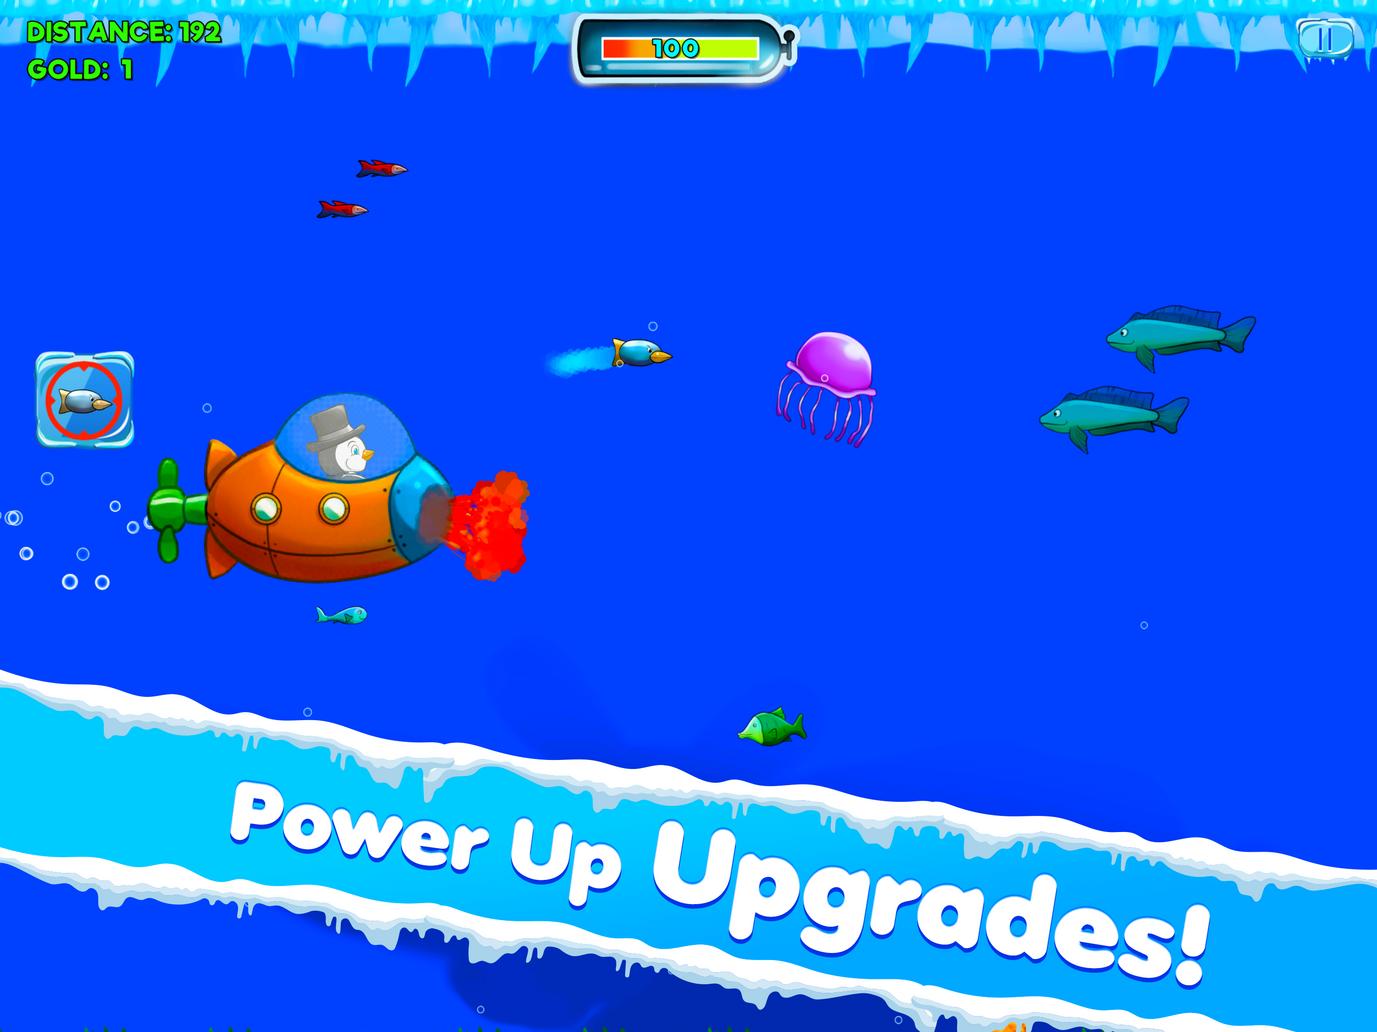 Power up upgrades!